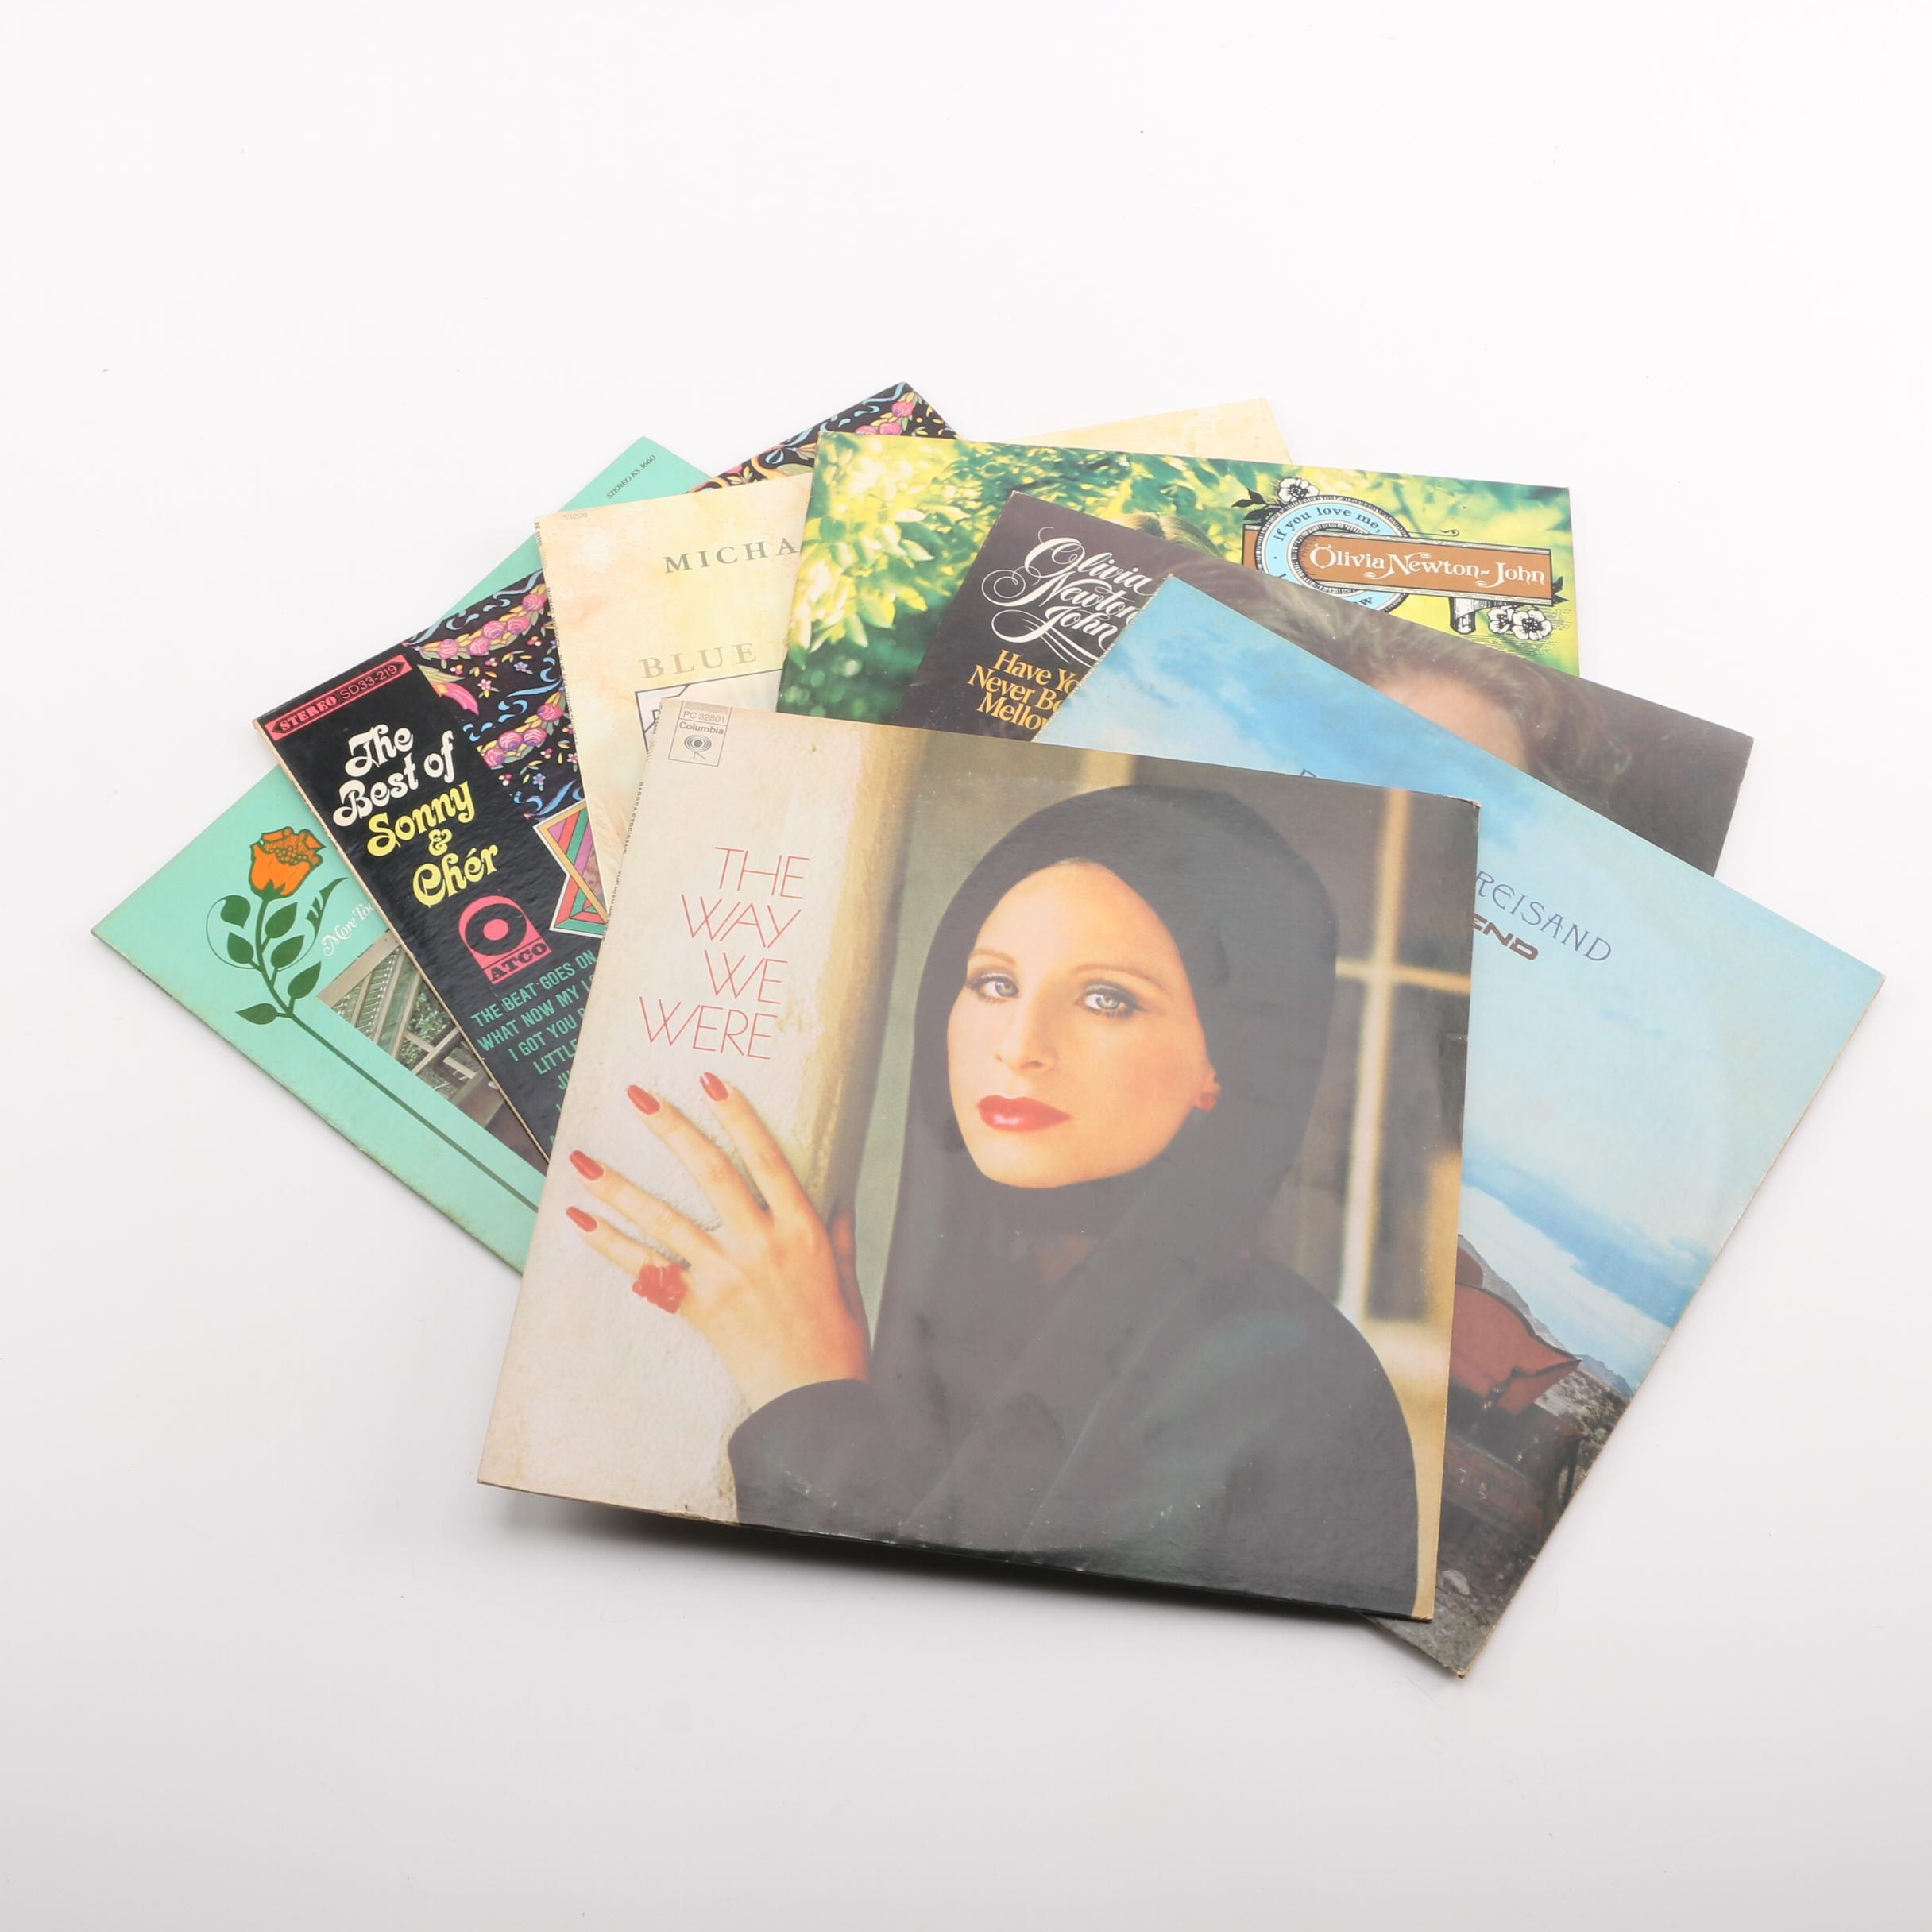 Barbra Streisand, Olivia Newton John, and Other Records